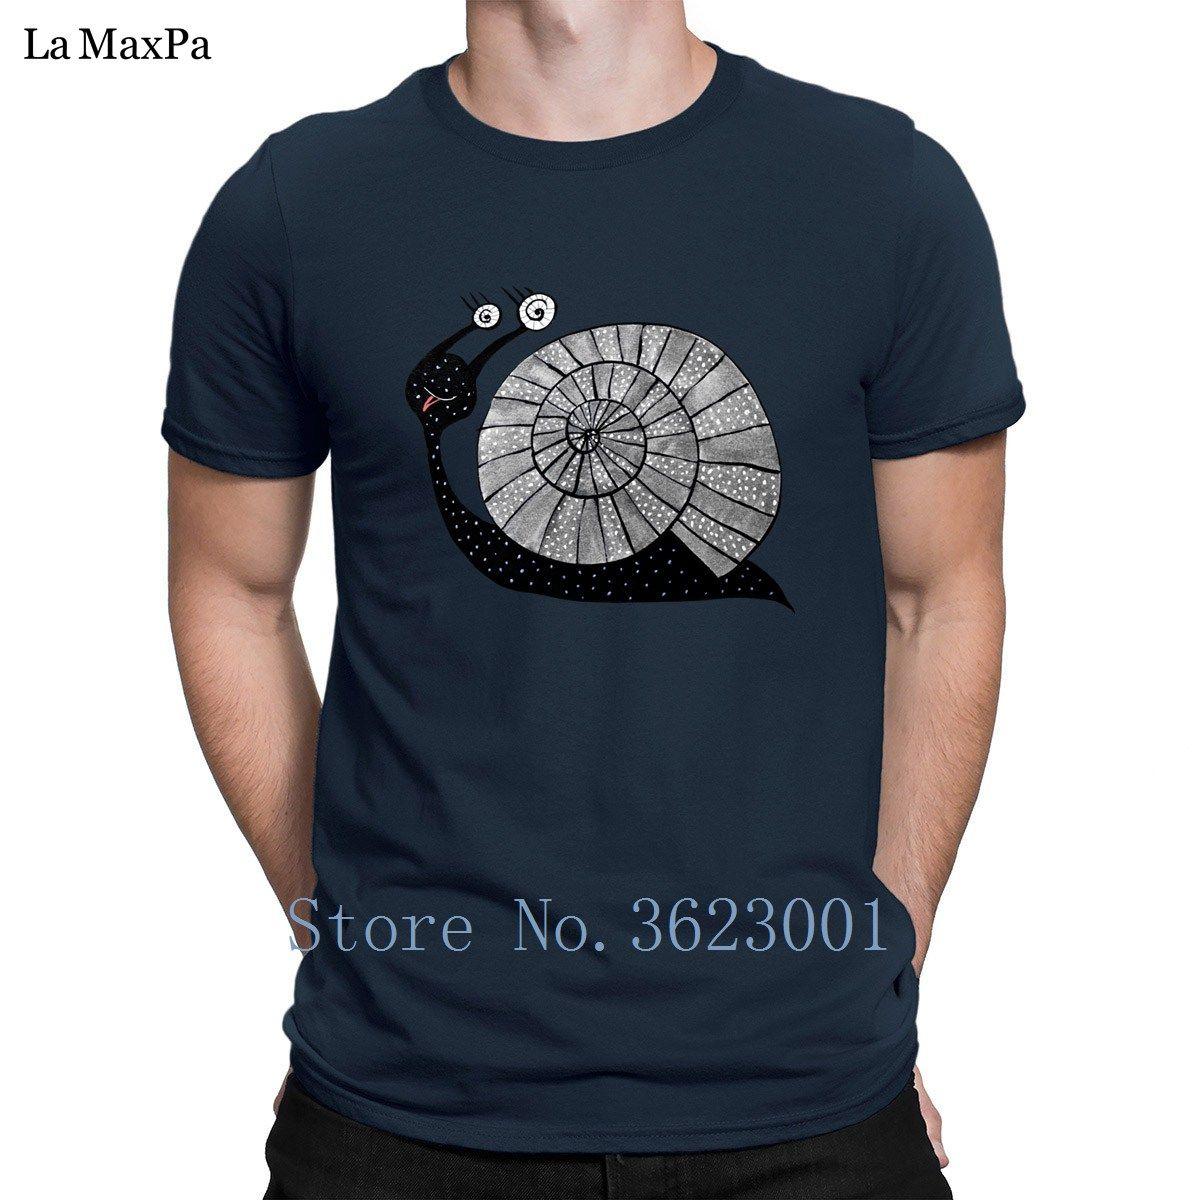 Custom Letters Man Cartoon Snail With Spiral Eyes Men's Tee Shirt Newest O-Neck T Shirts Slogan T-Shirt Cheap 2018